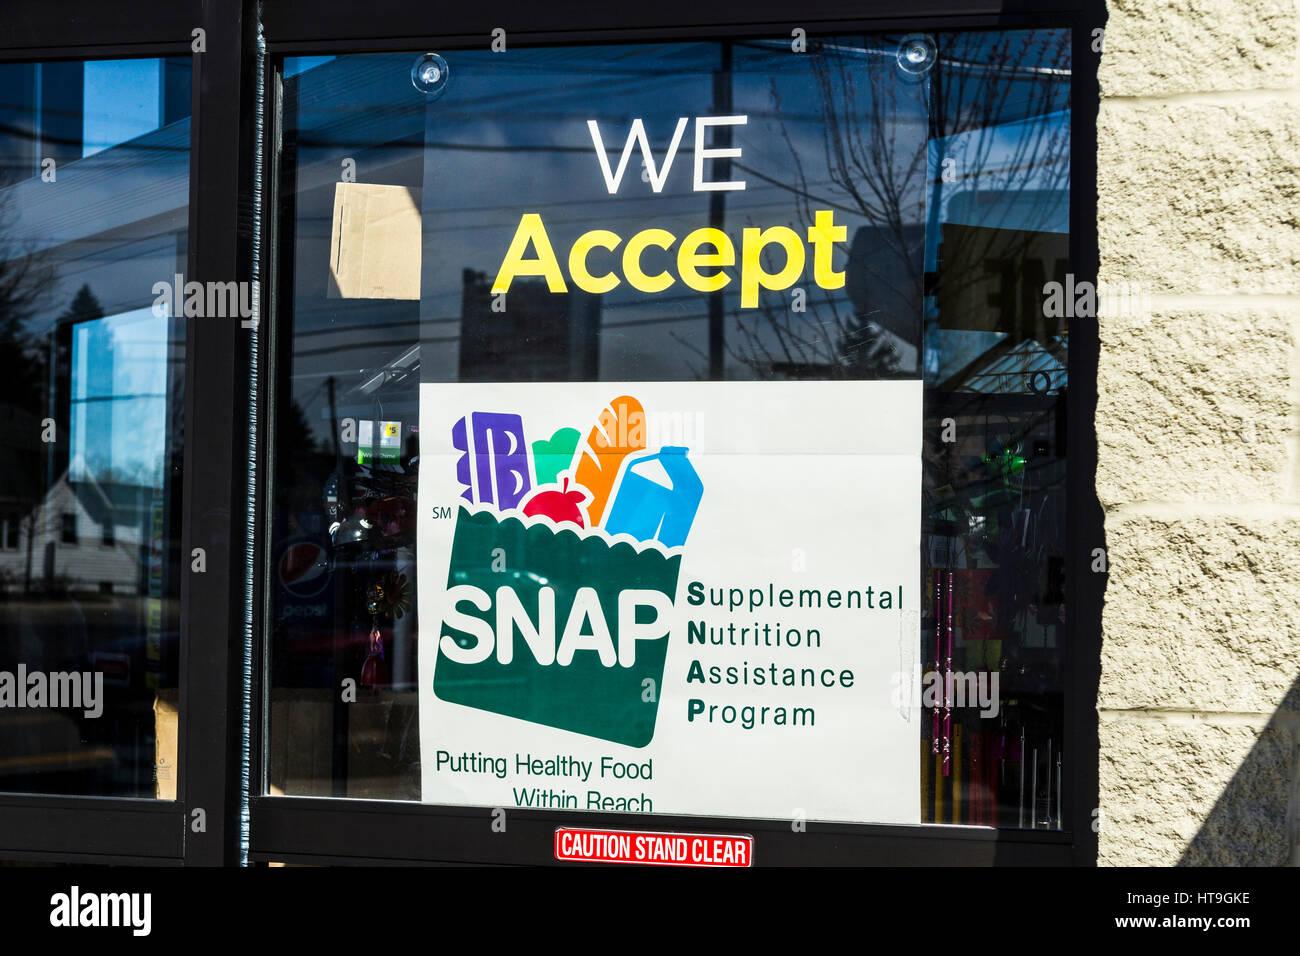 Muncie - Circa March 2017: A Sign at a Retailer - We Accept SNAP II - Stock Image